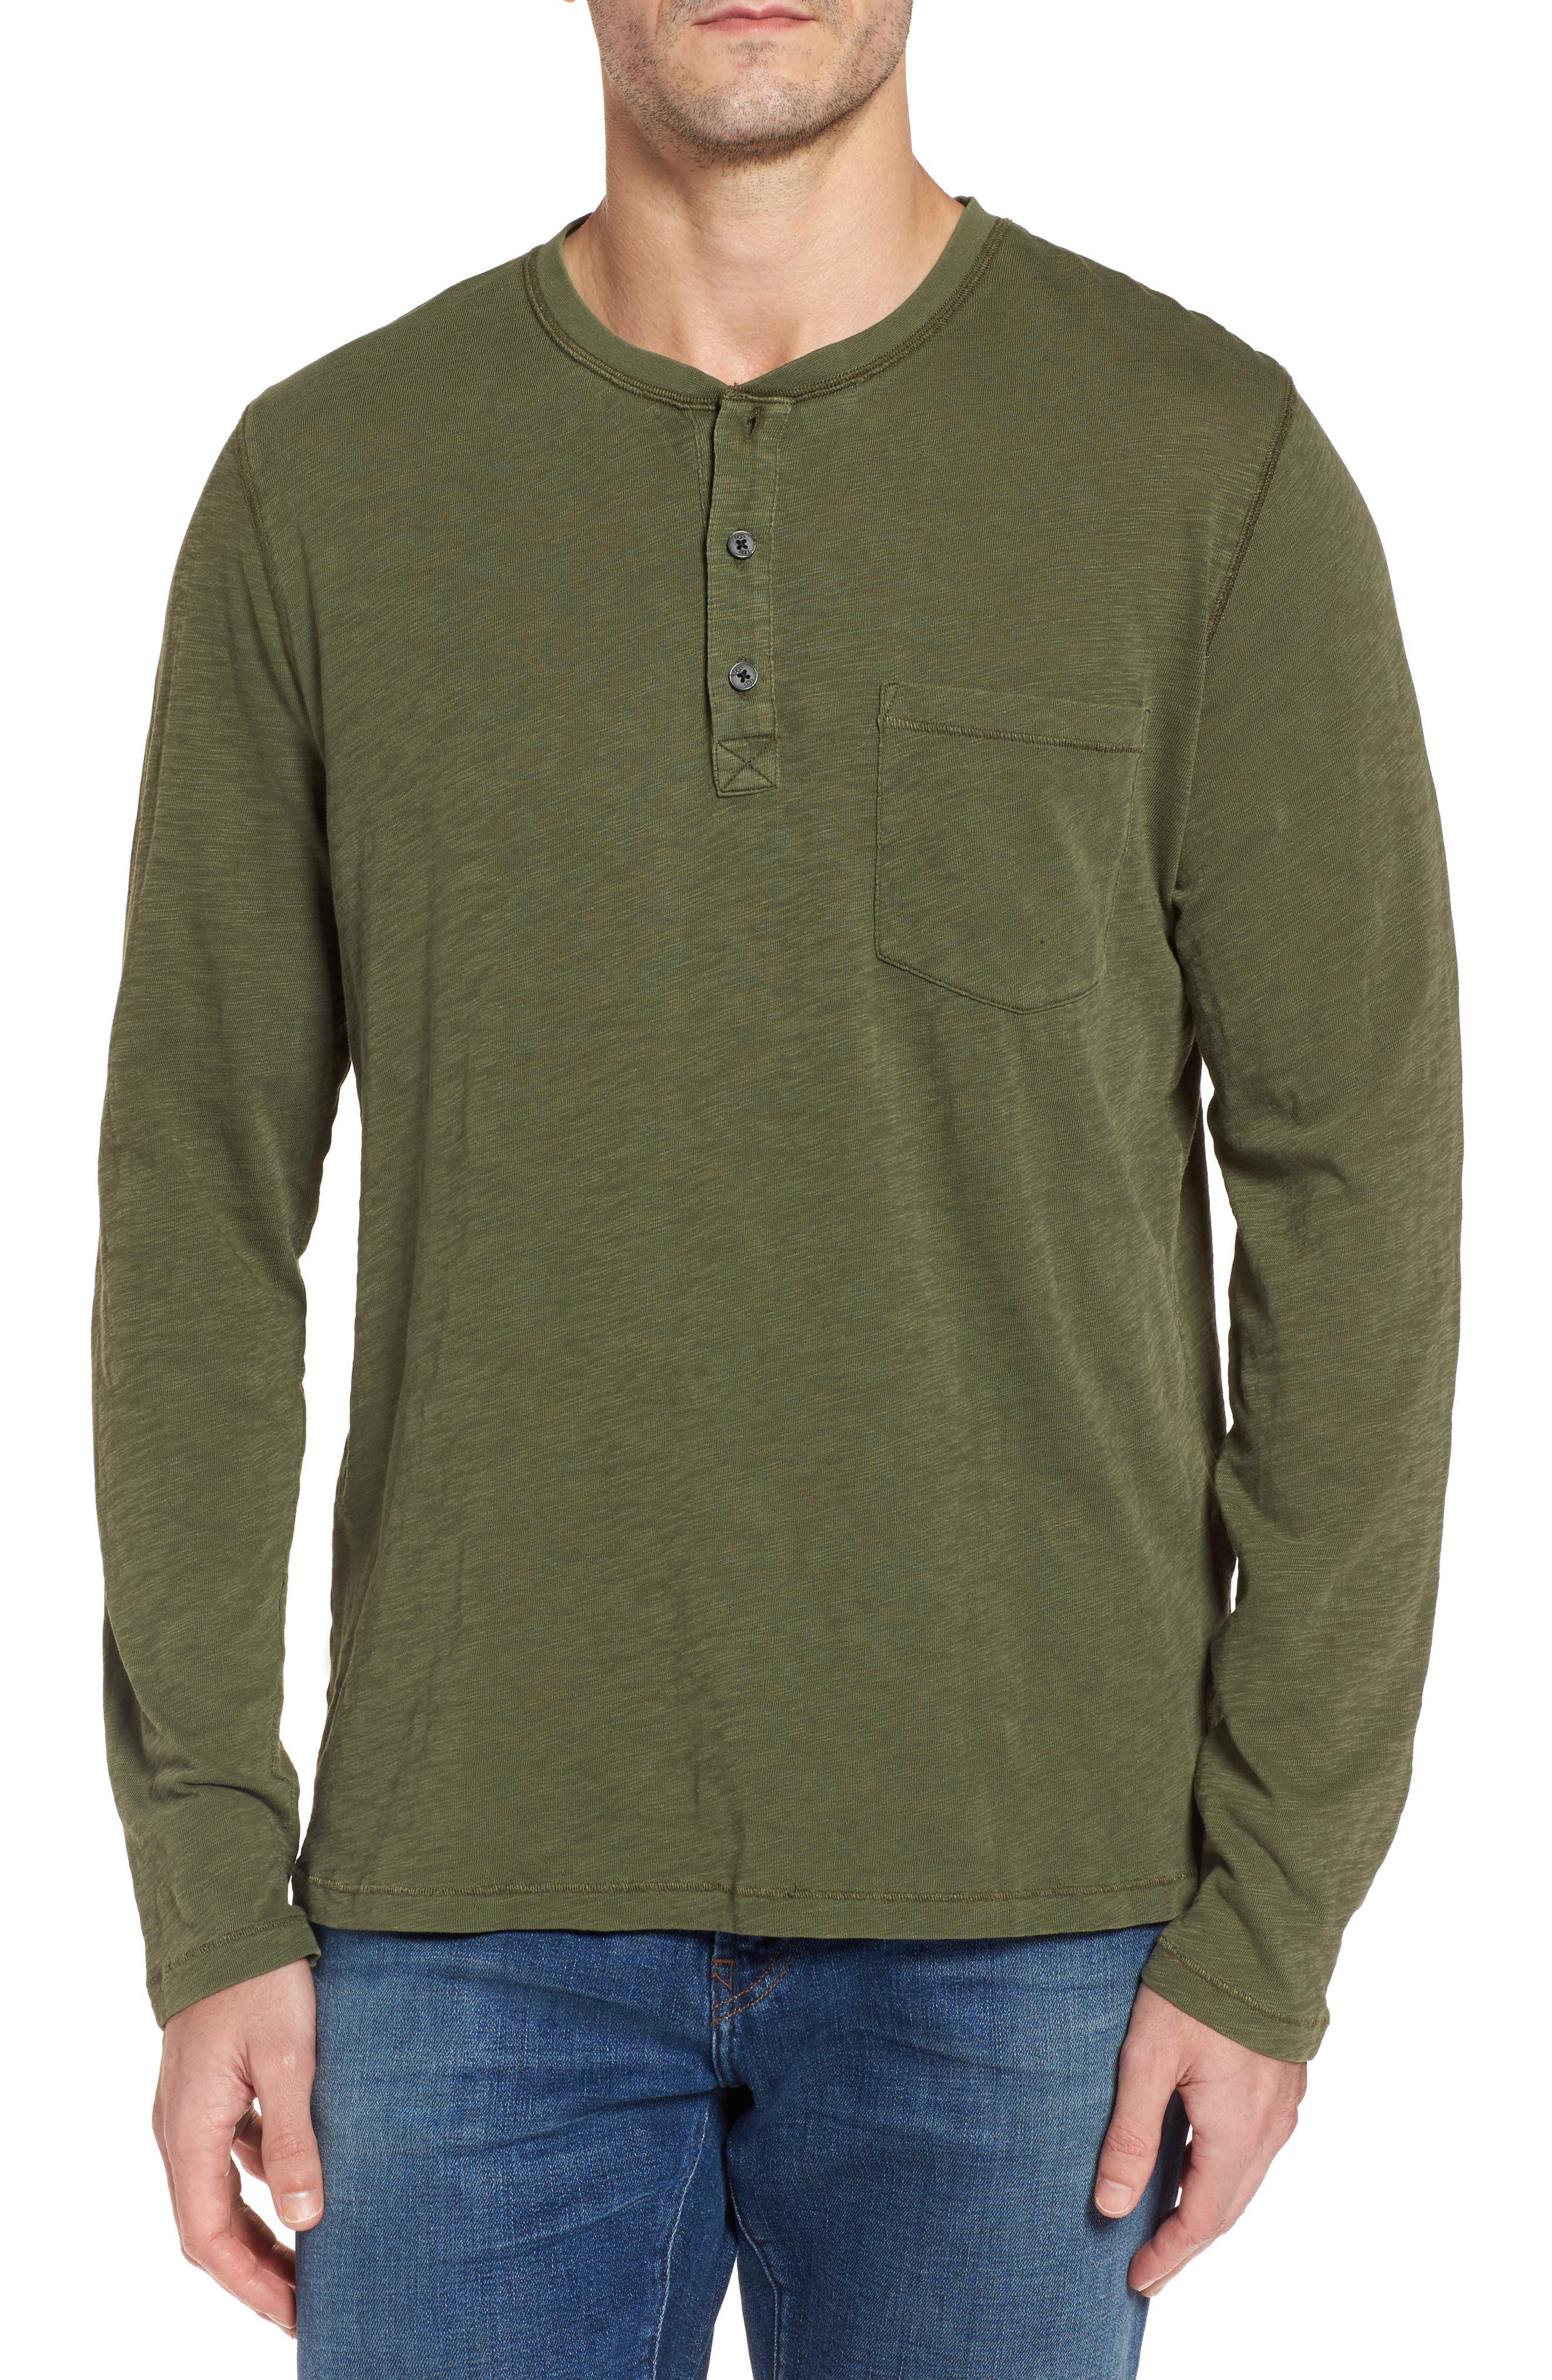 Alternate Image 1 Selected - UGG® Long Sleeve Henley T-Shirt